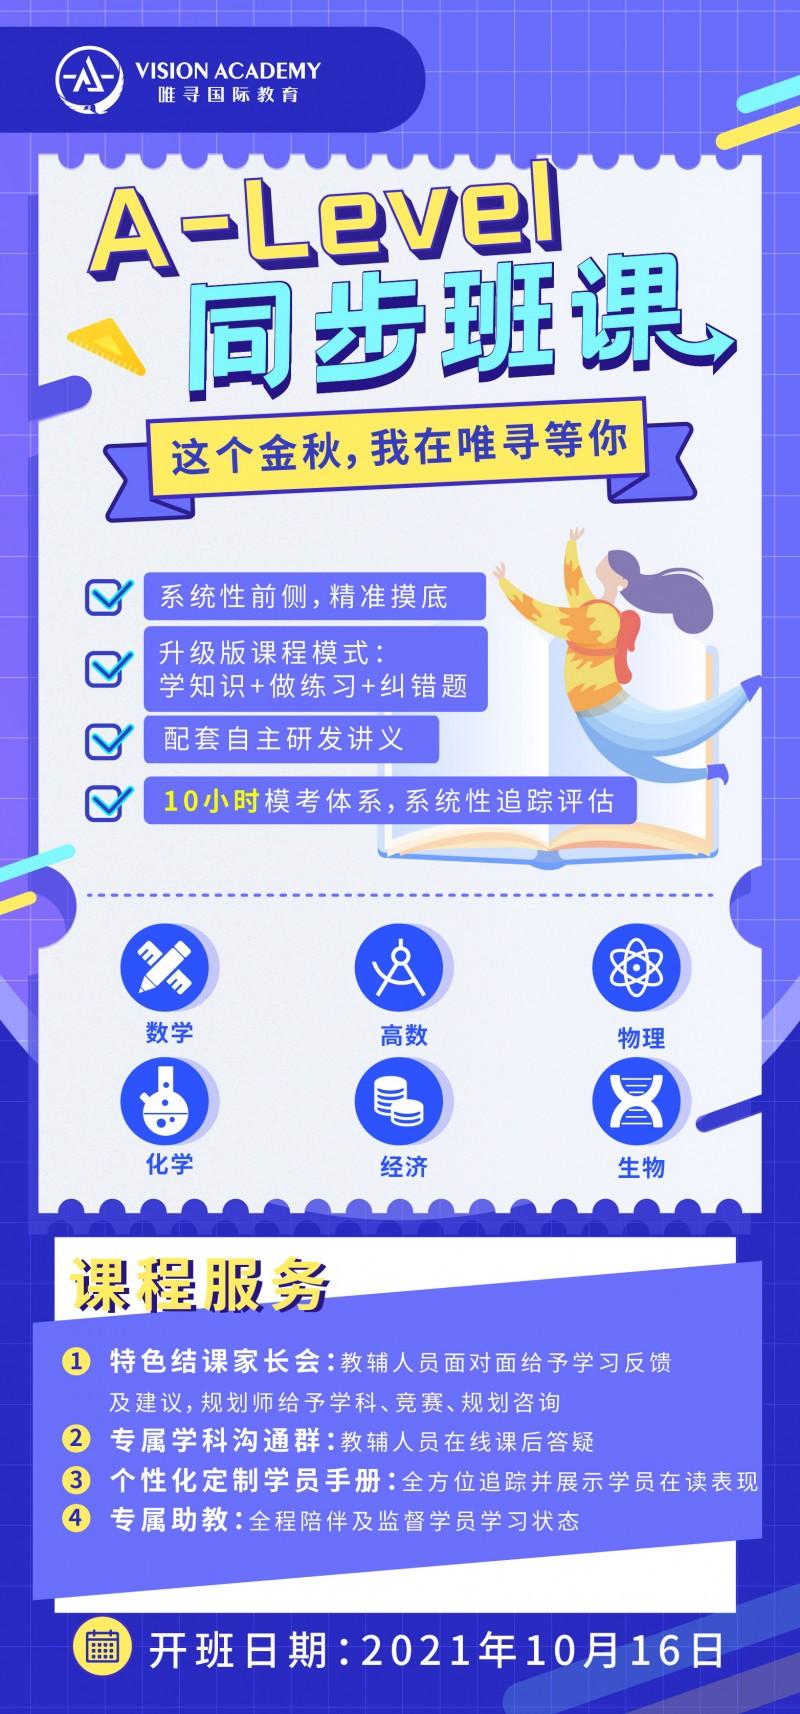 Alevel中文怎样拿高分呢?取决于这4个部分内容图片_3